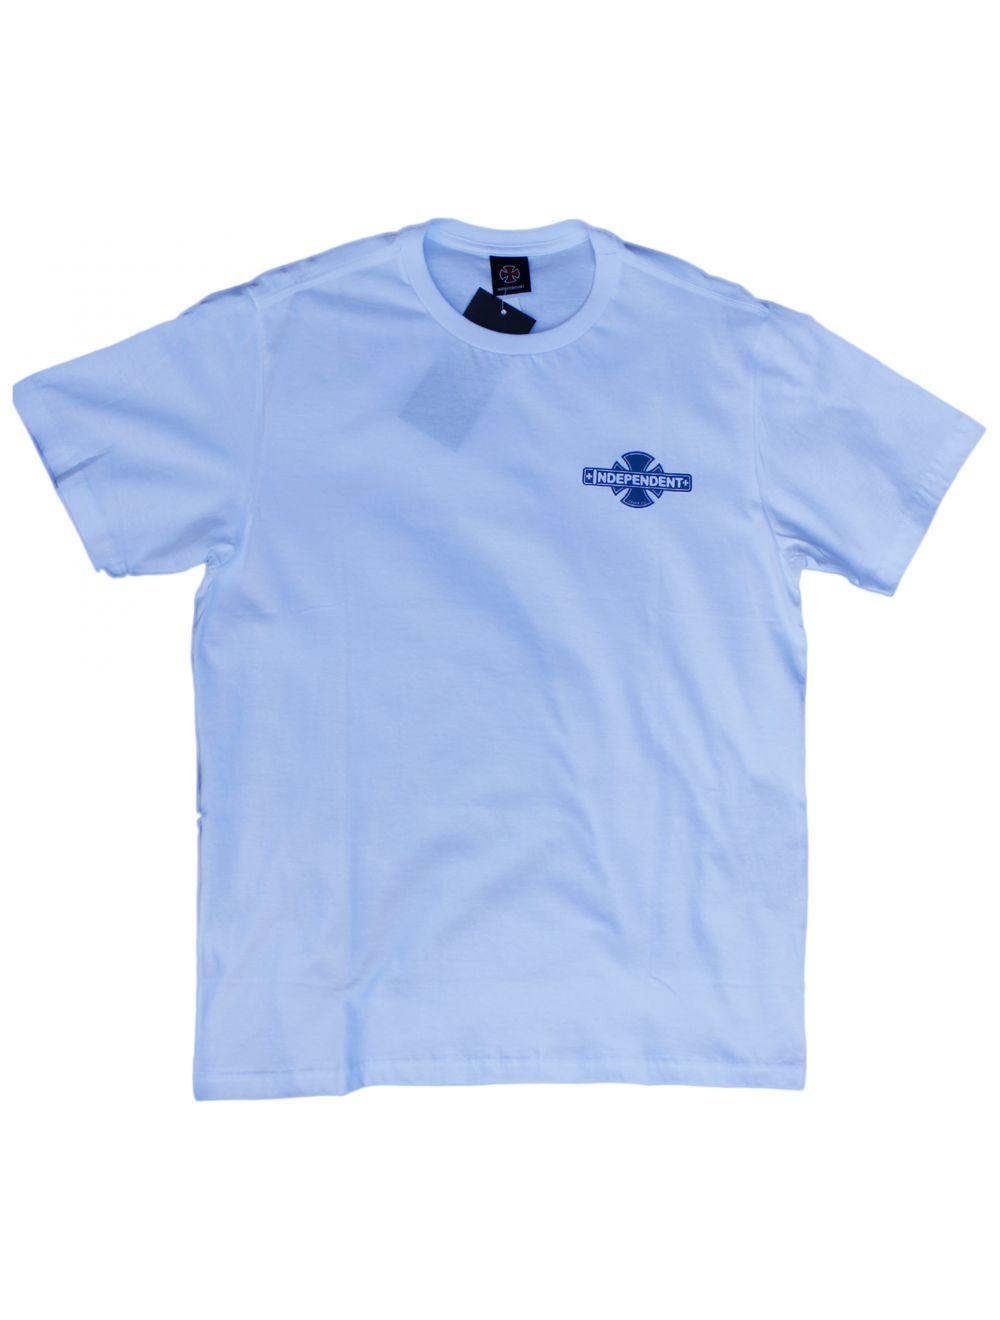 Camiseta Independent Cross Fill